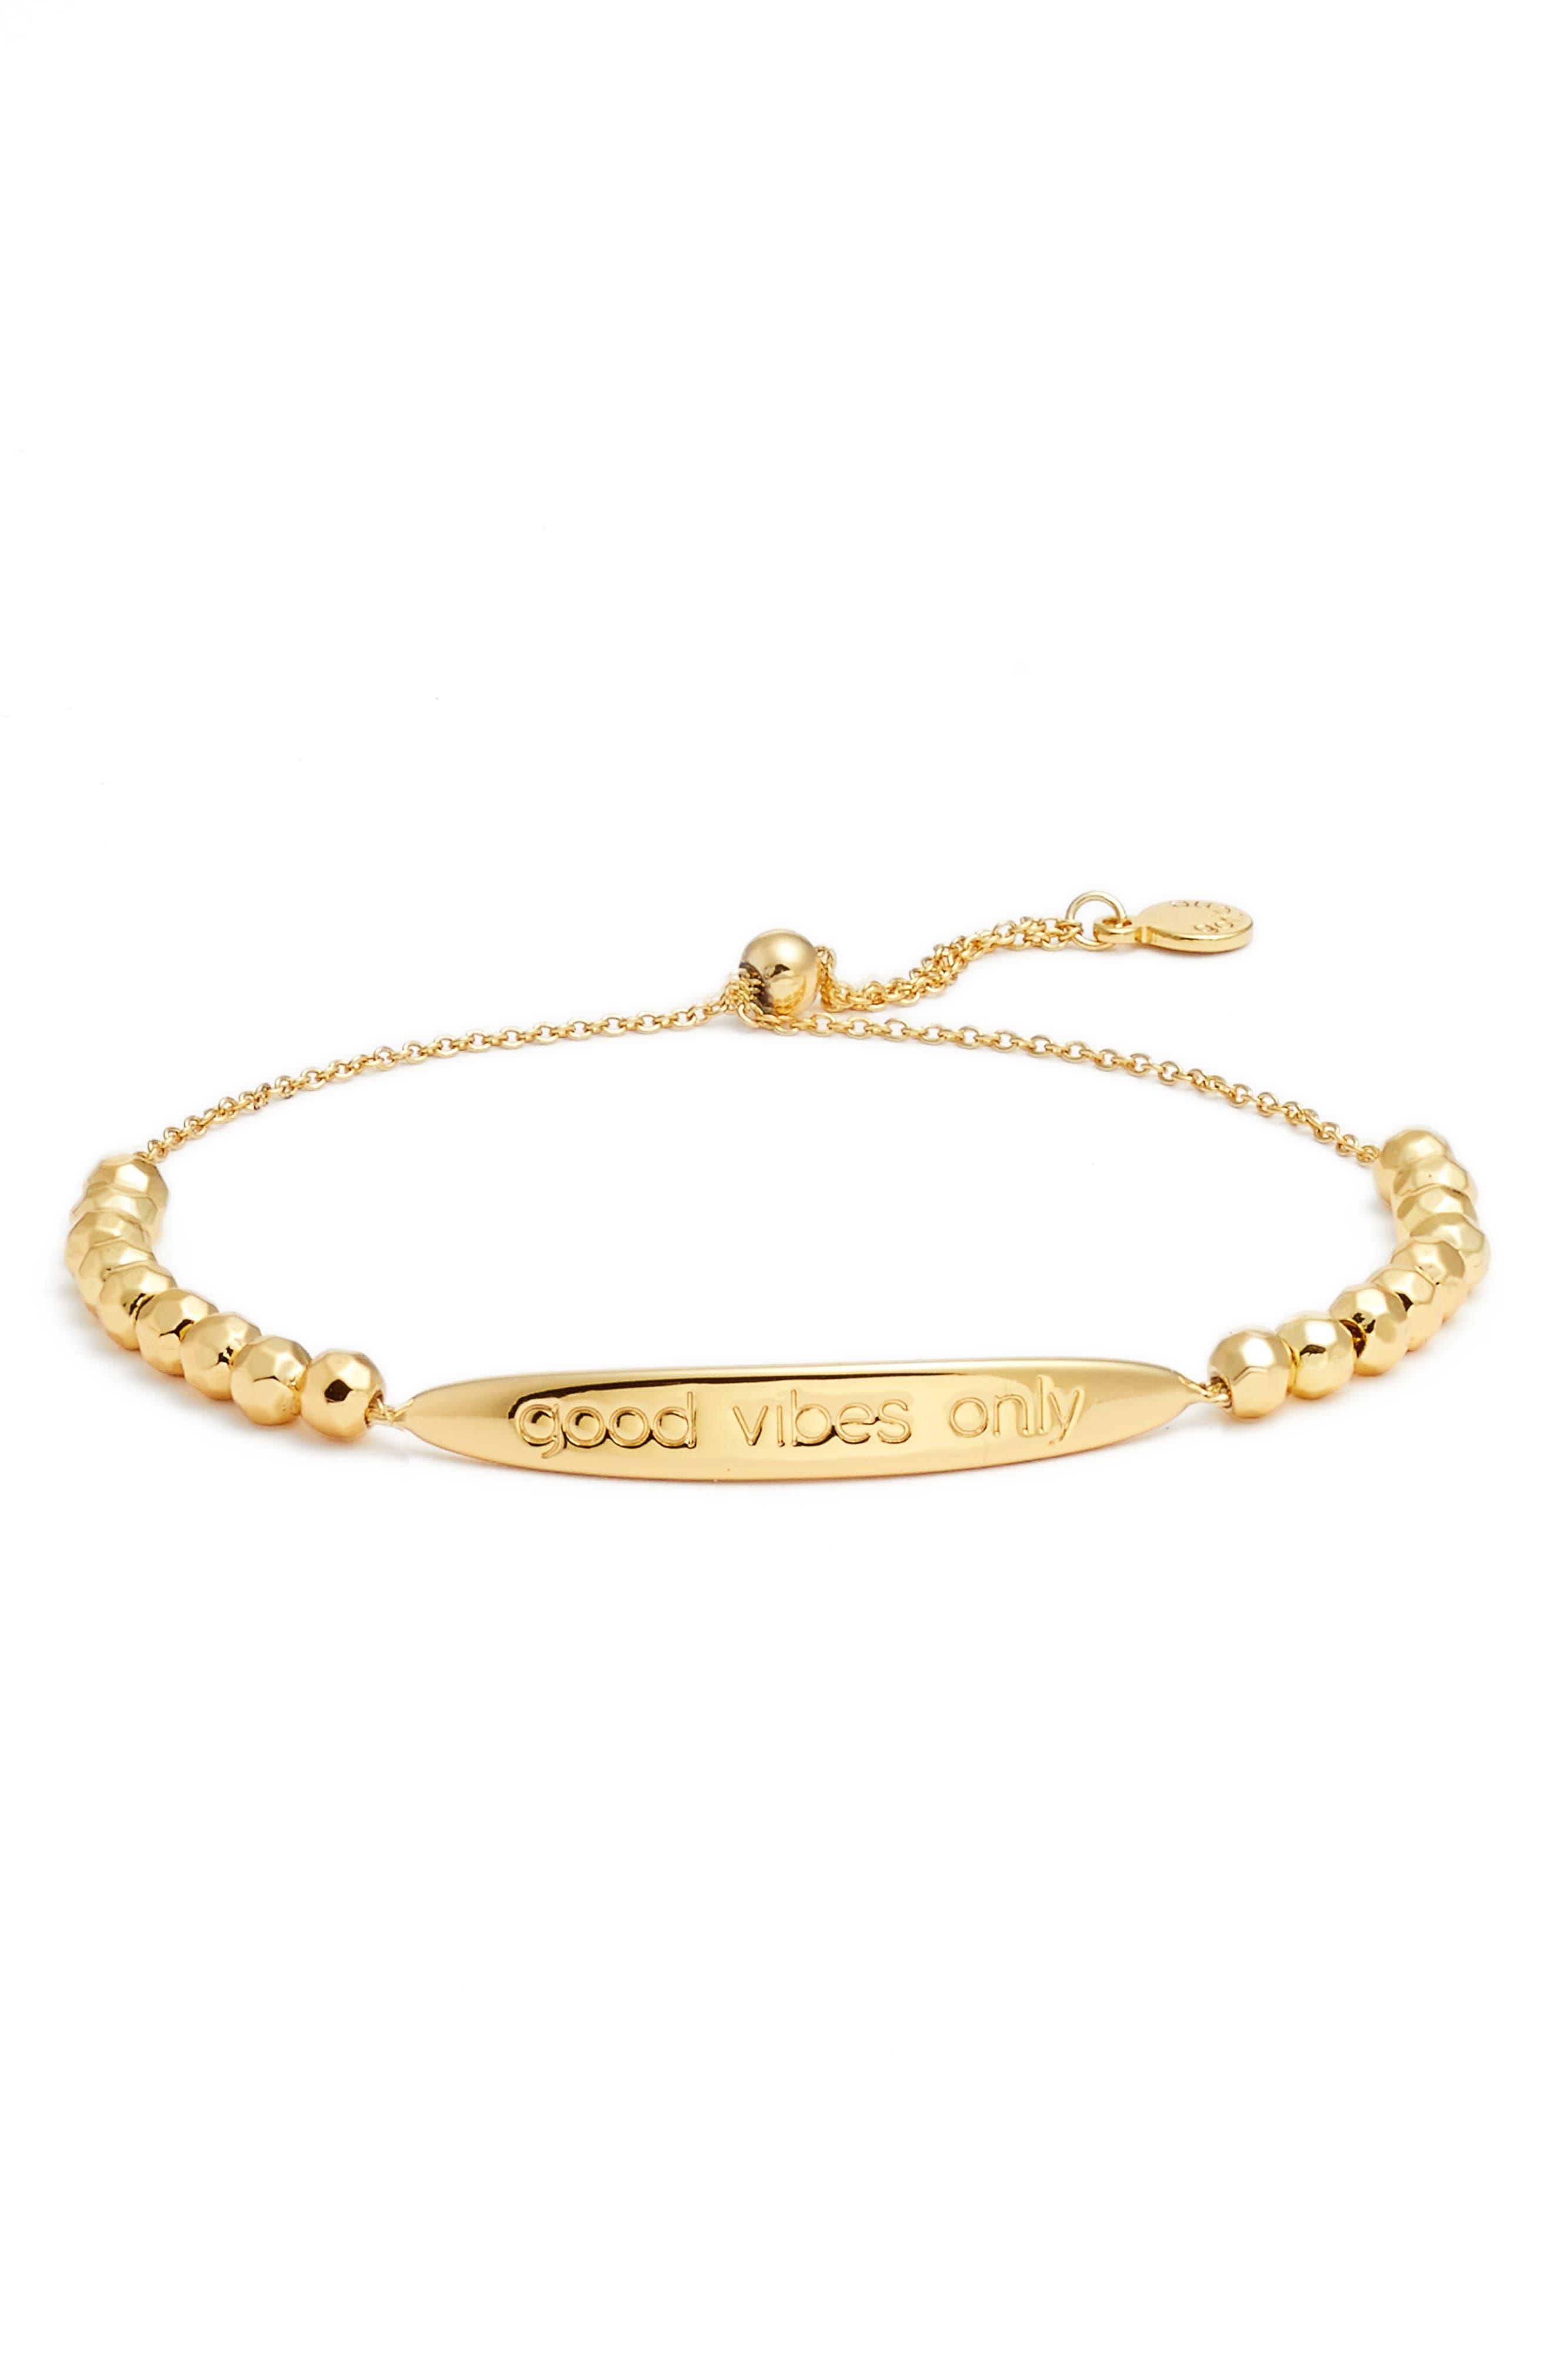 Main Image - gorjana Power Intention Bracelet Good Vibes Only Bracelet